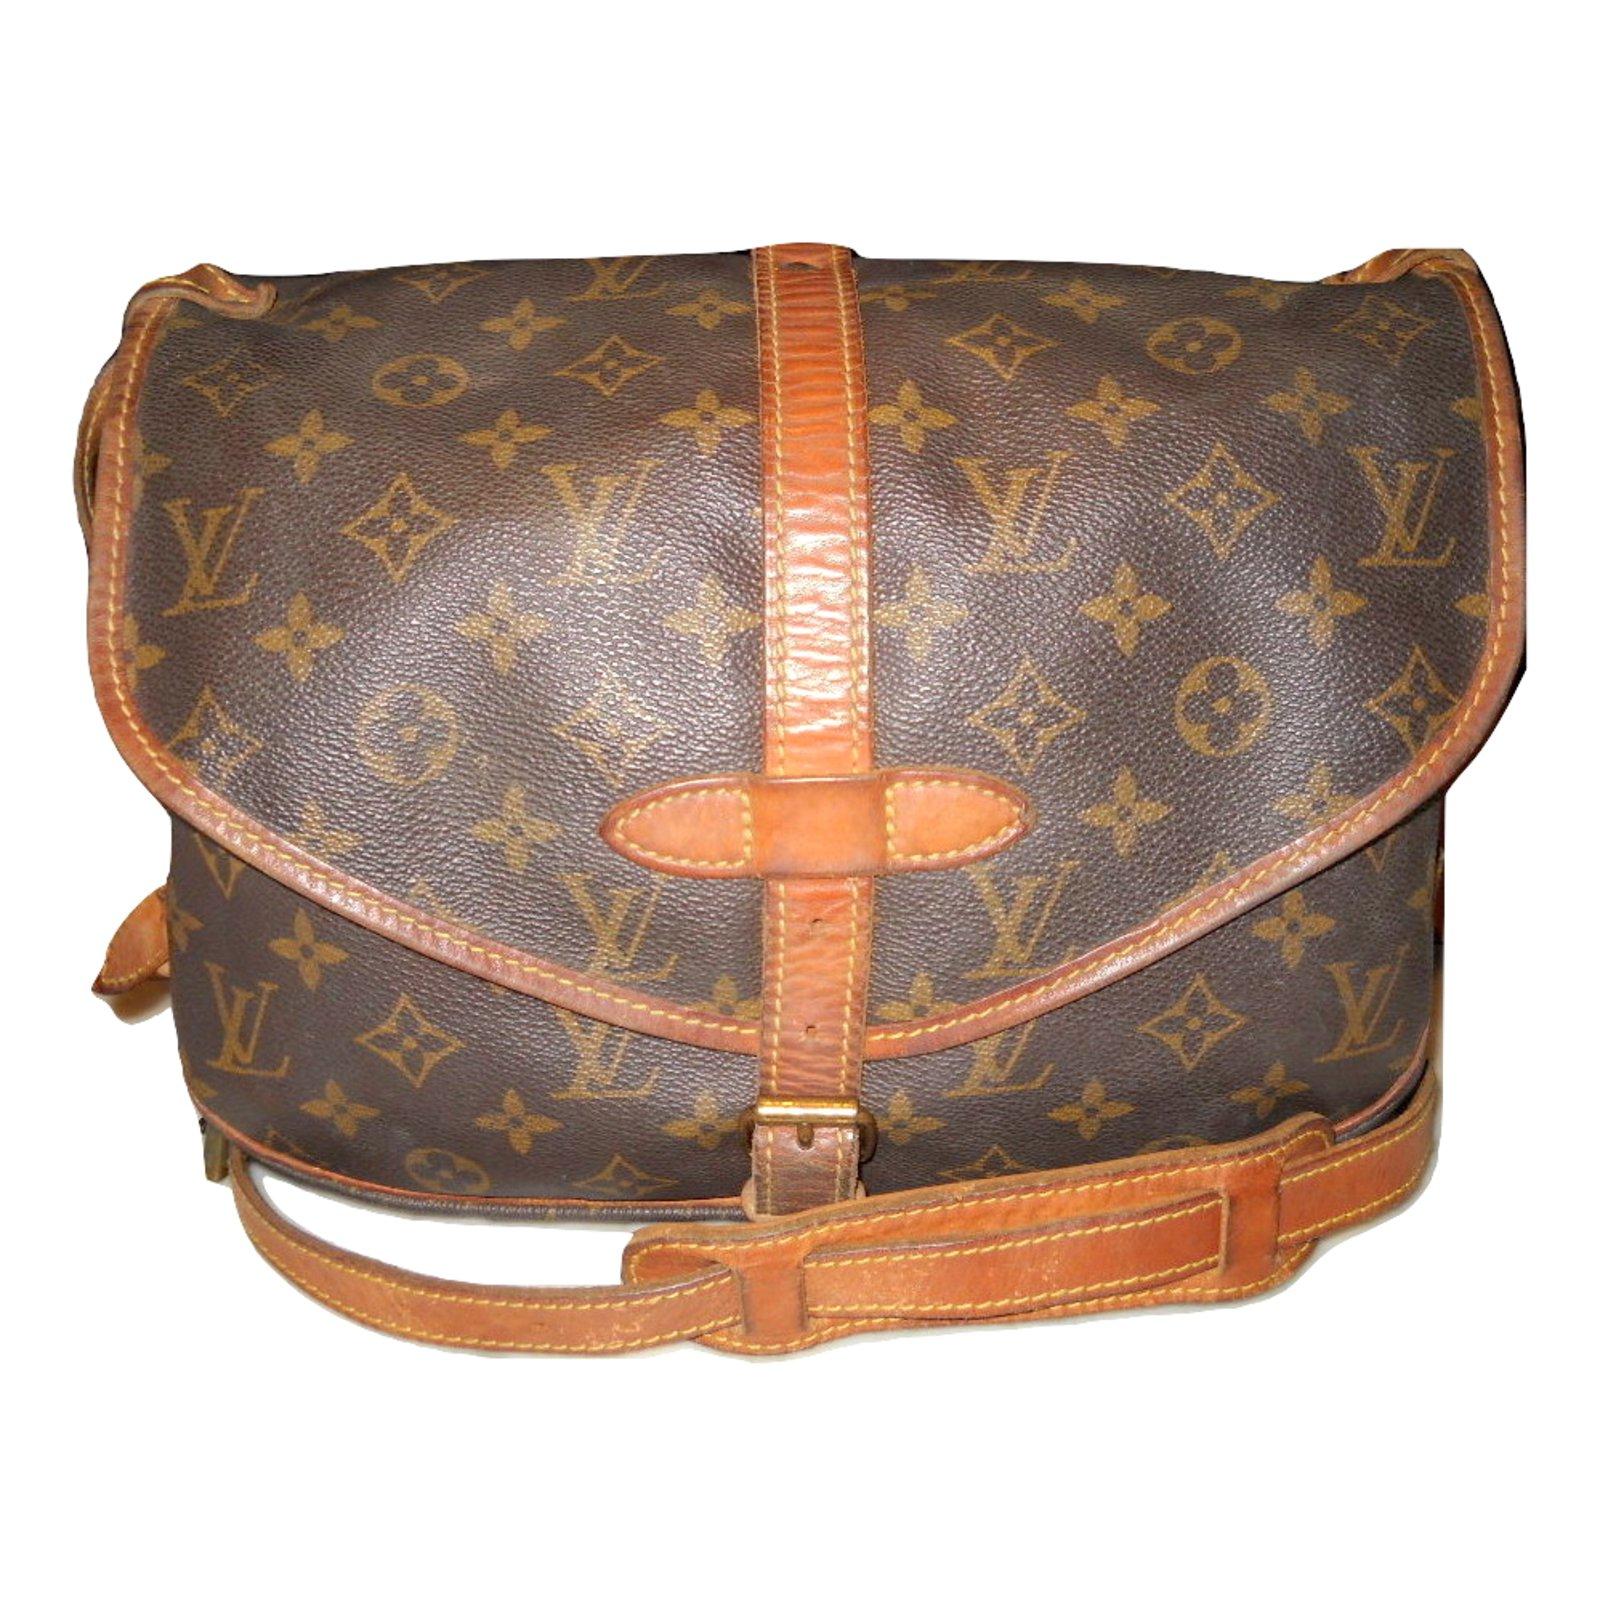 Louis Vuitton Vintage Saumur 30 Monogram Handbags Leather Cloth Brown Ref 56037